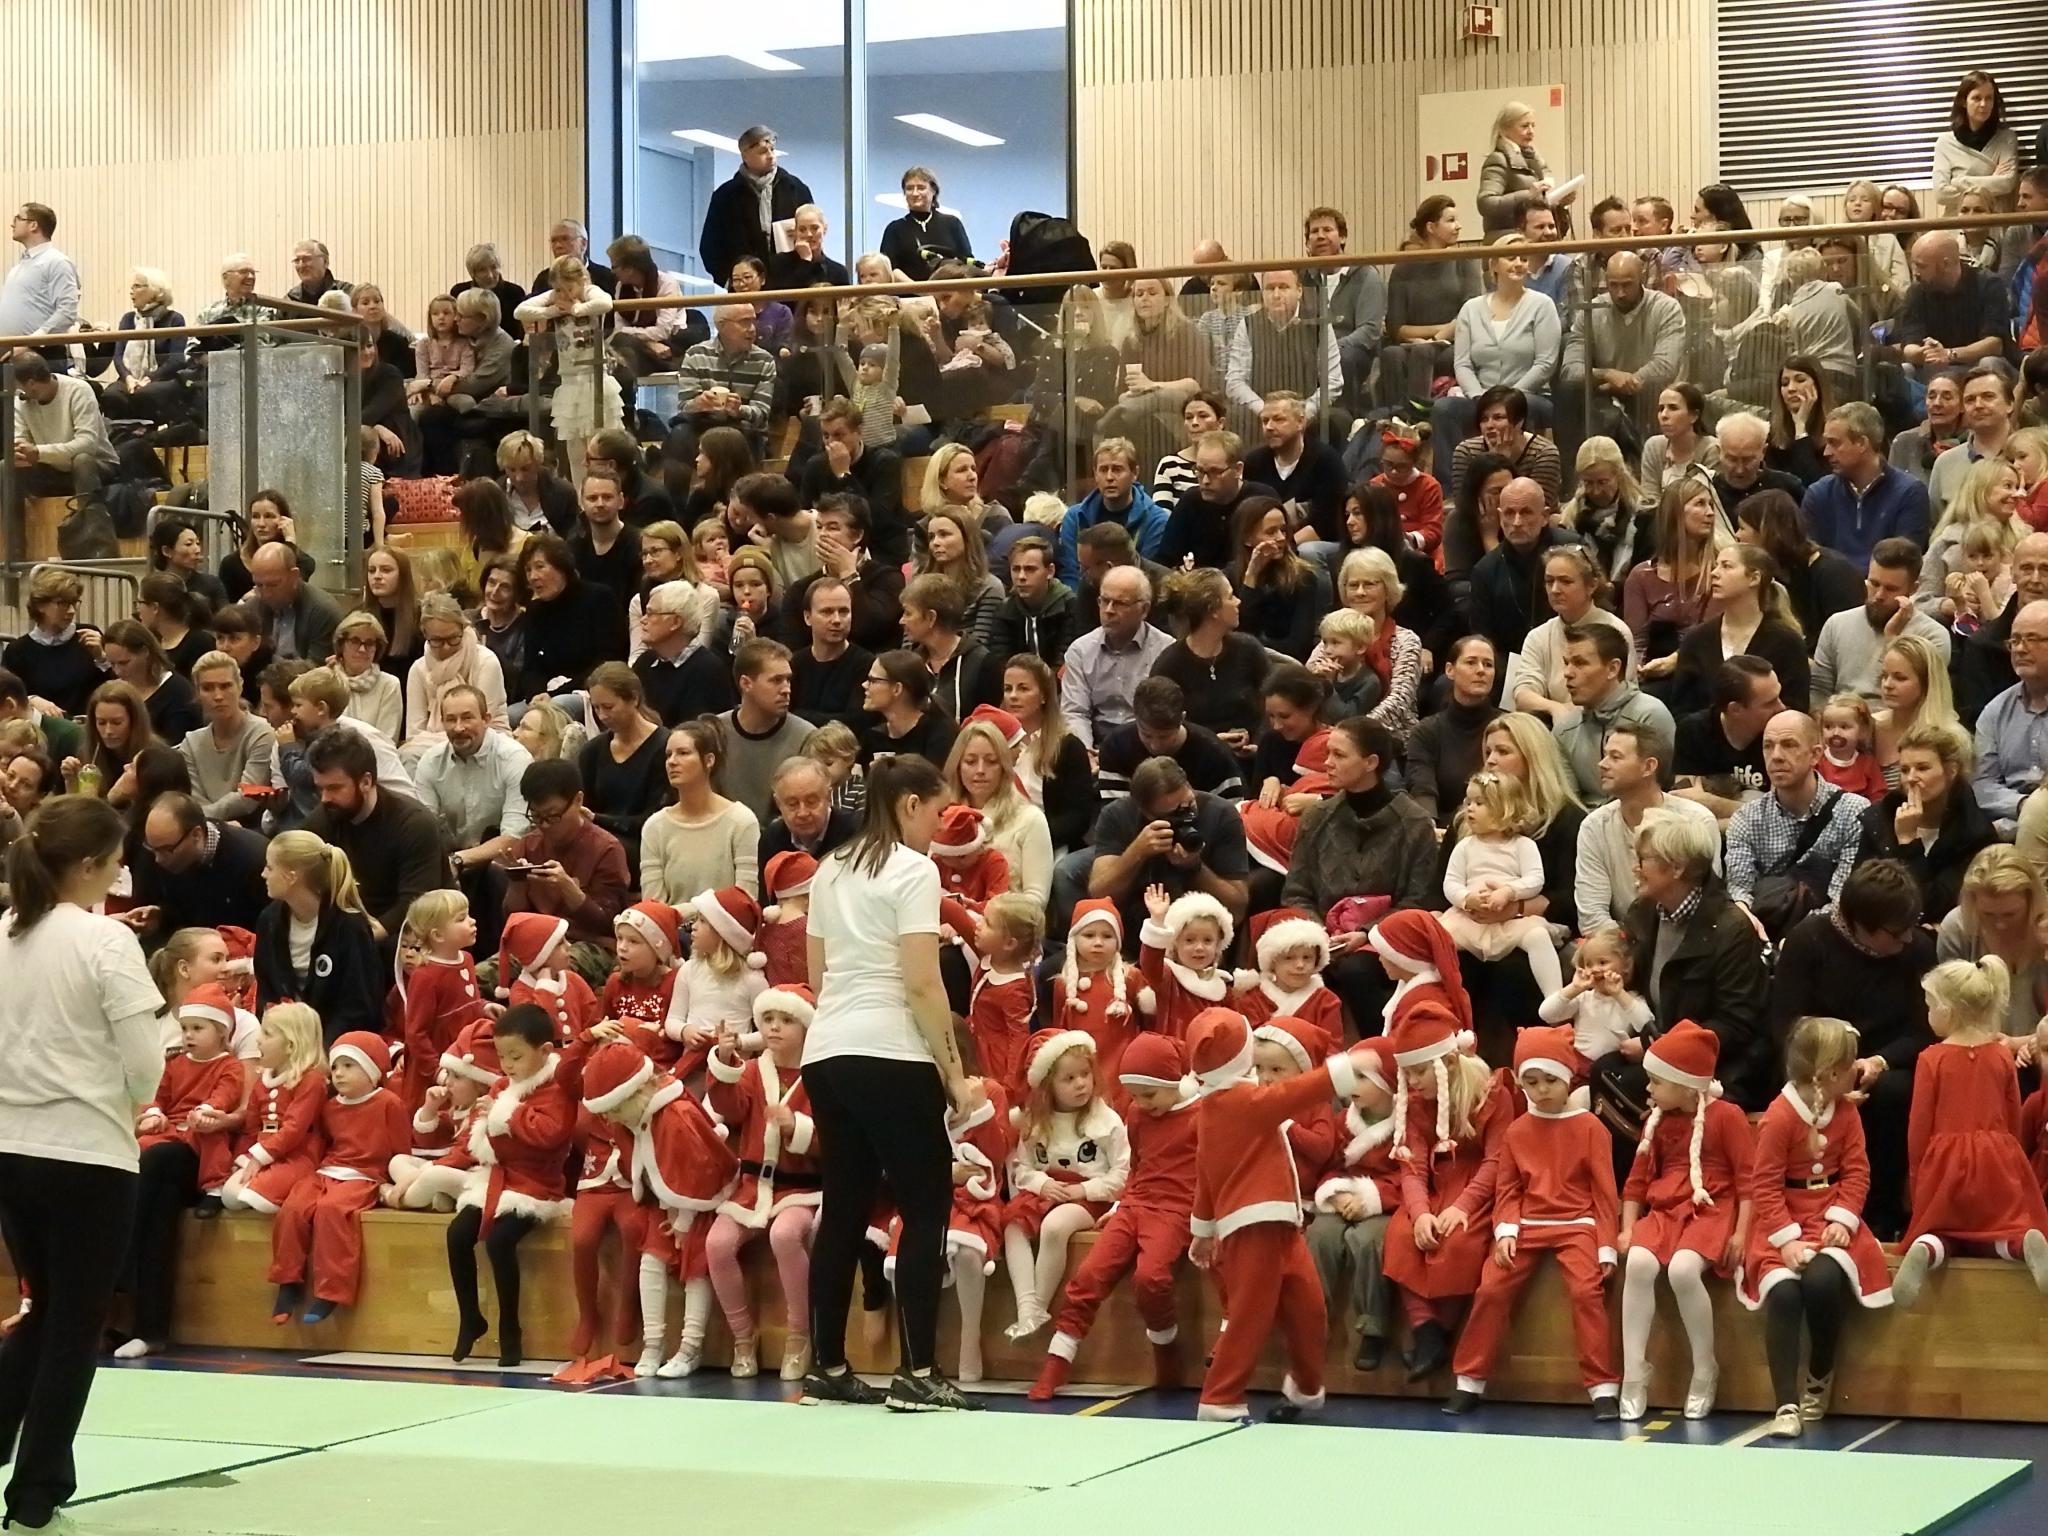 juleoppvisning-2016-foto-paal-alme-54